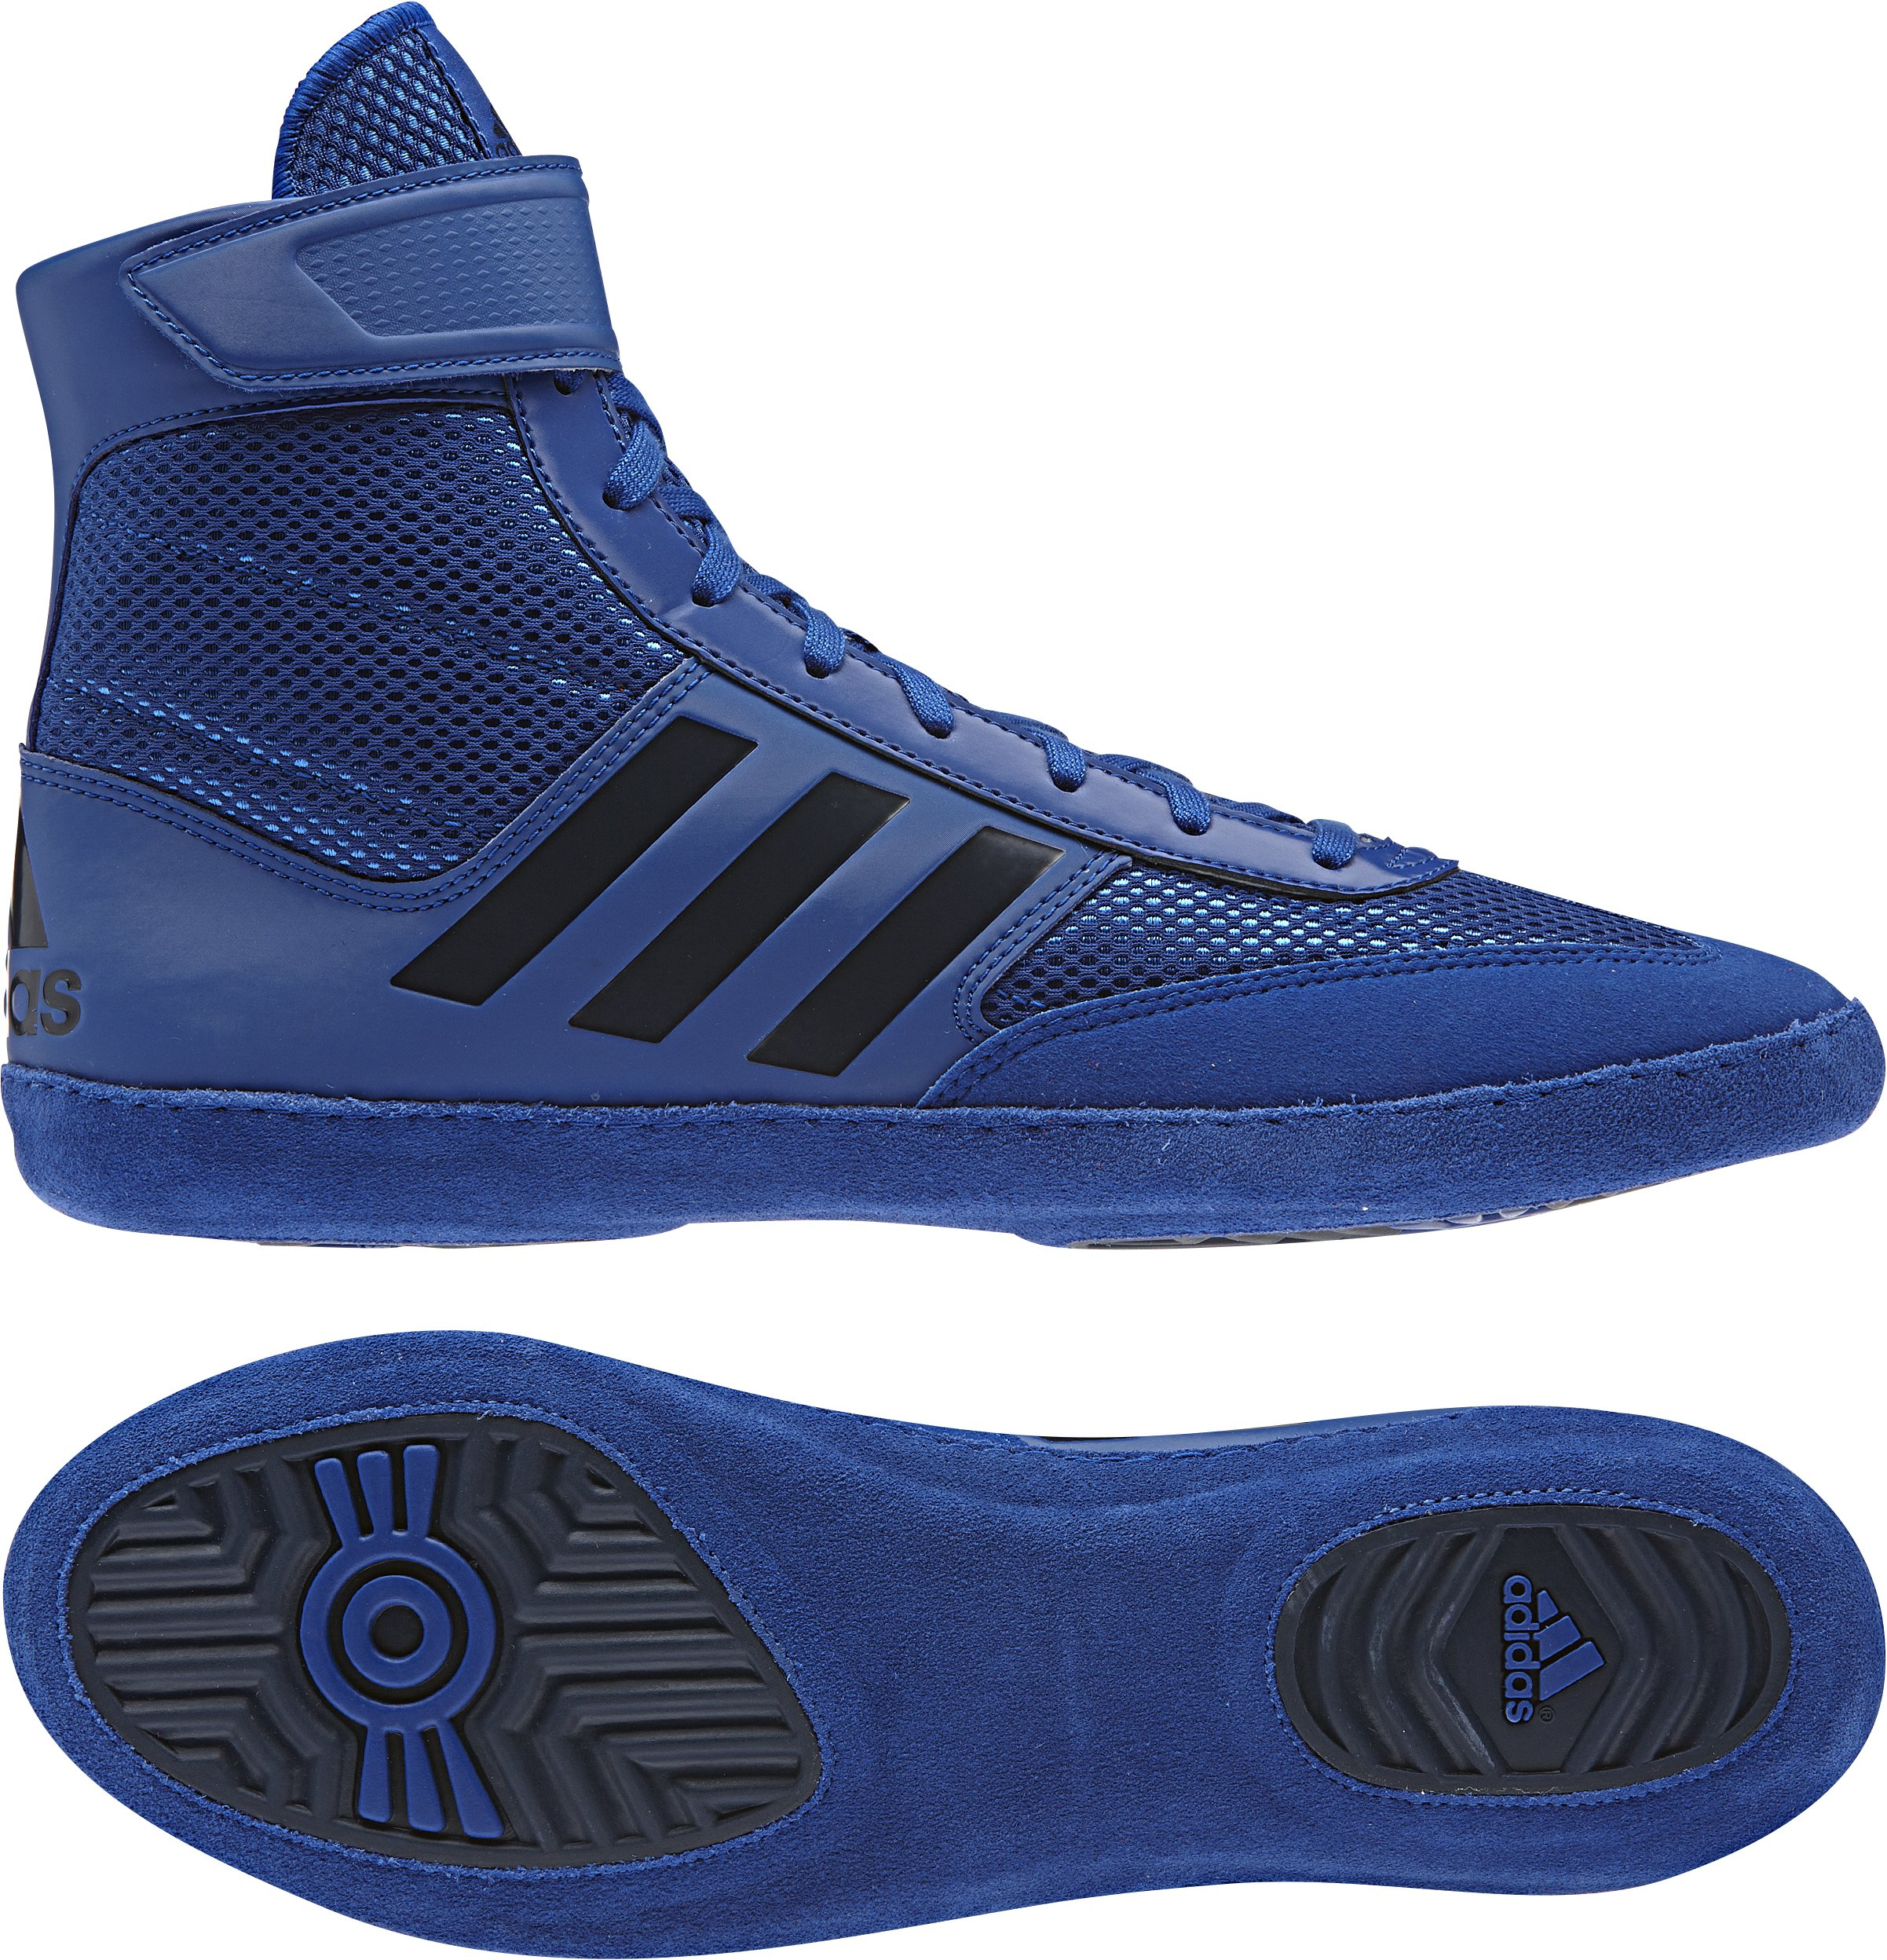 adidas Combat Speed 5 Men's Wrestling Shoes, Royal/Dark Royal, Size 4.5